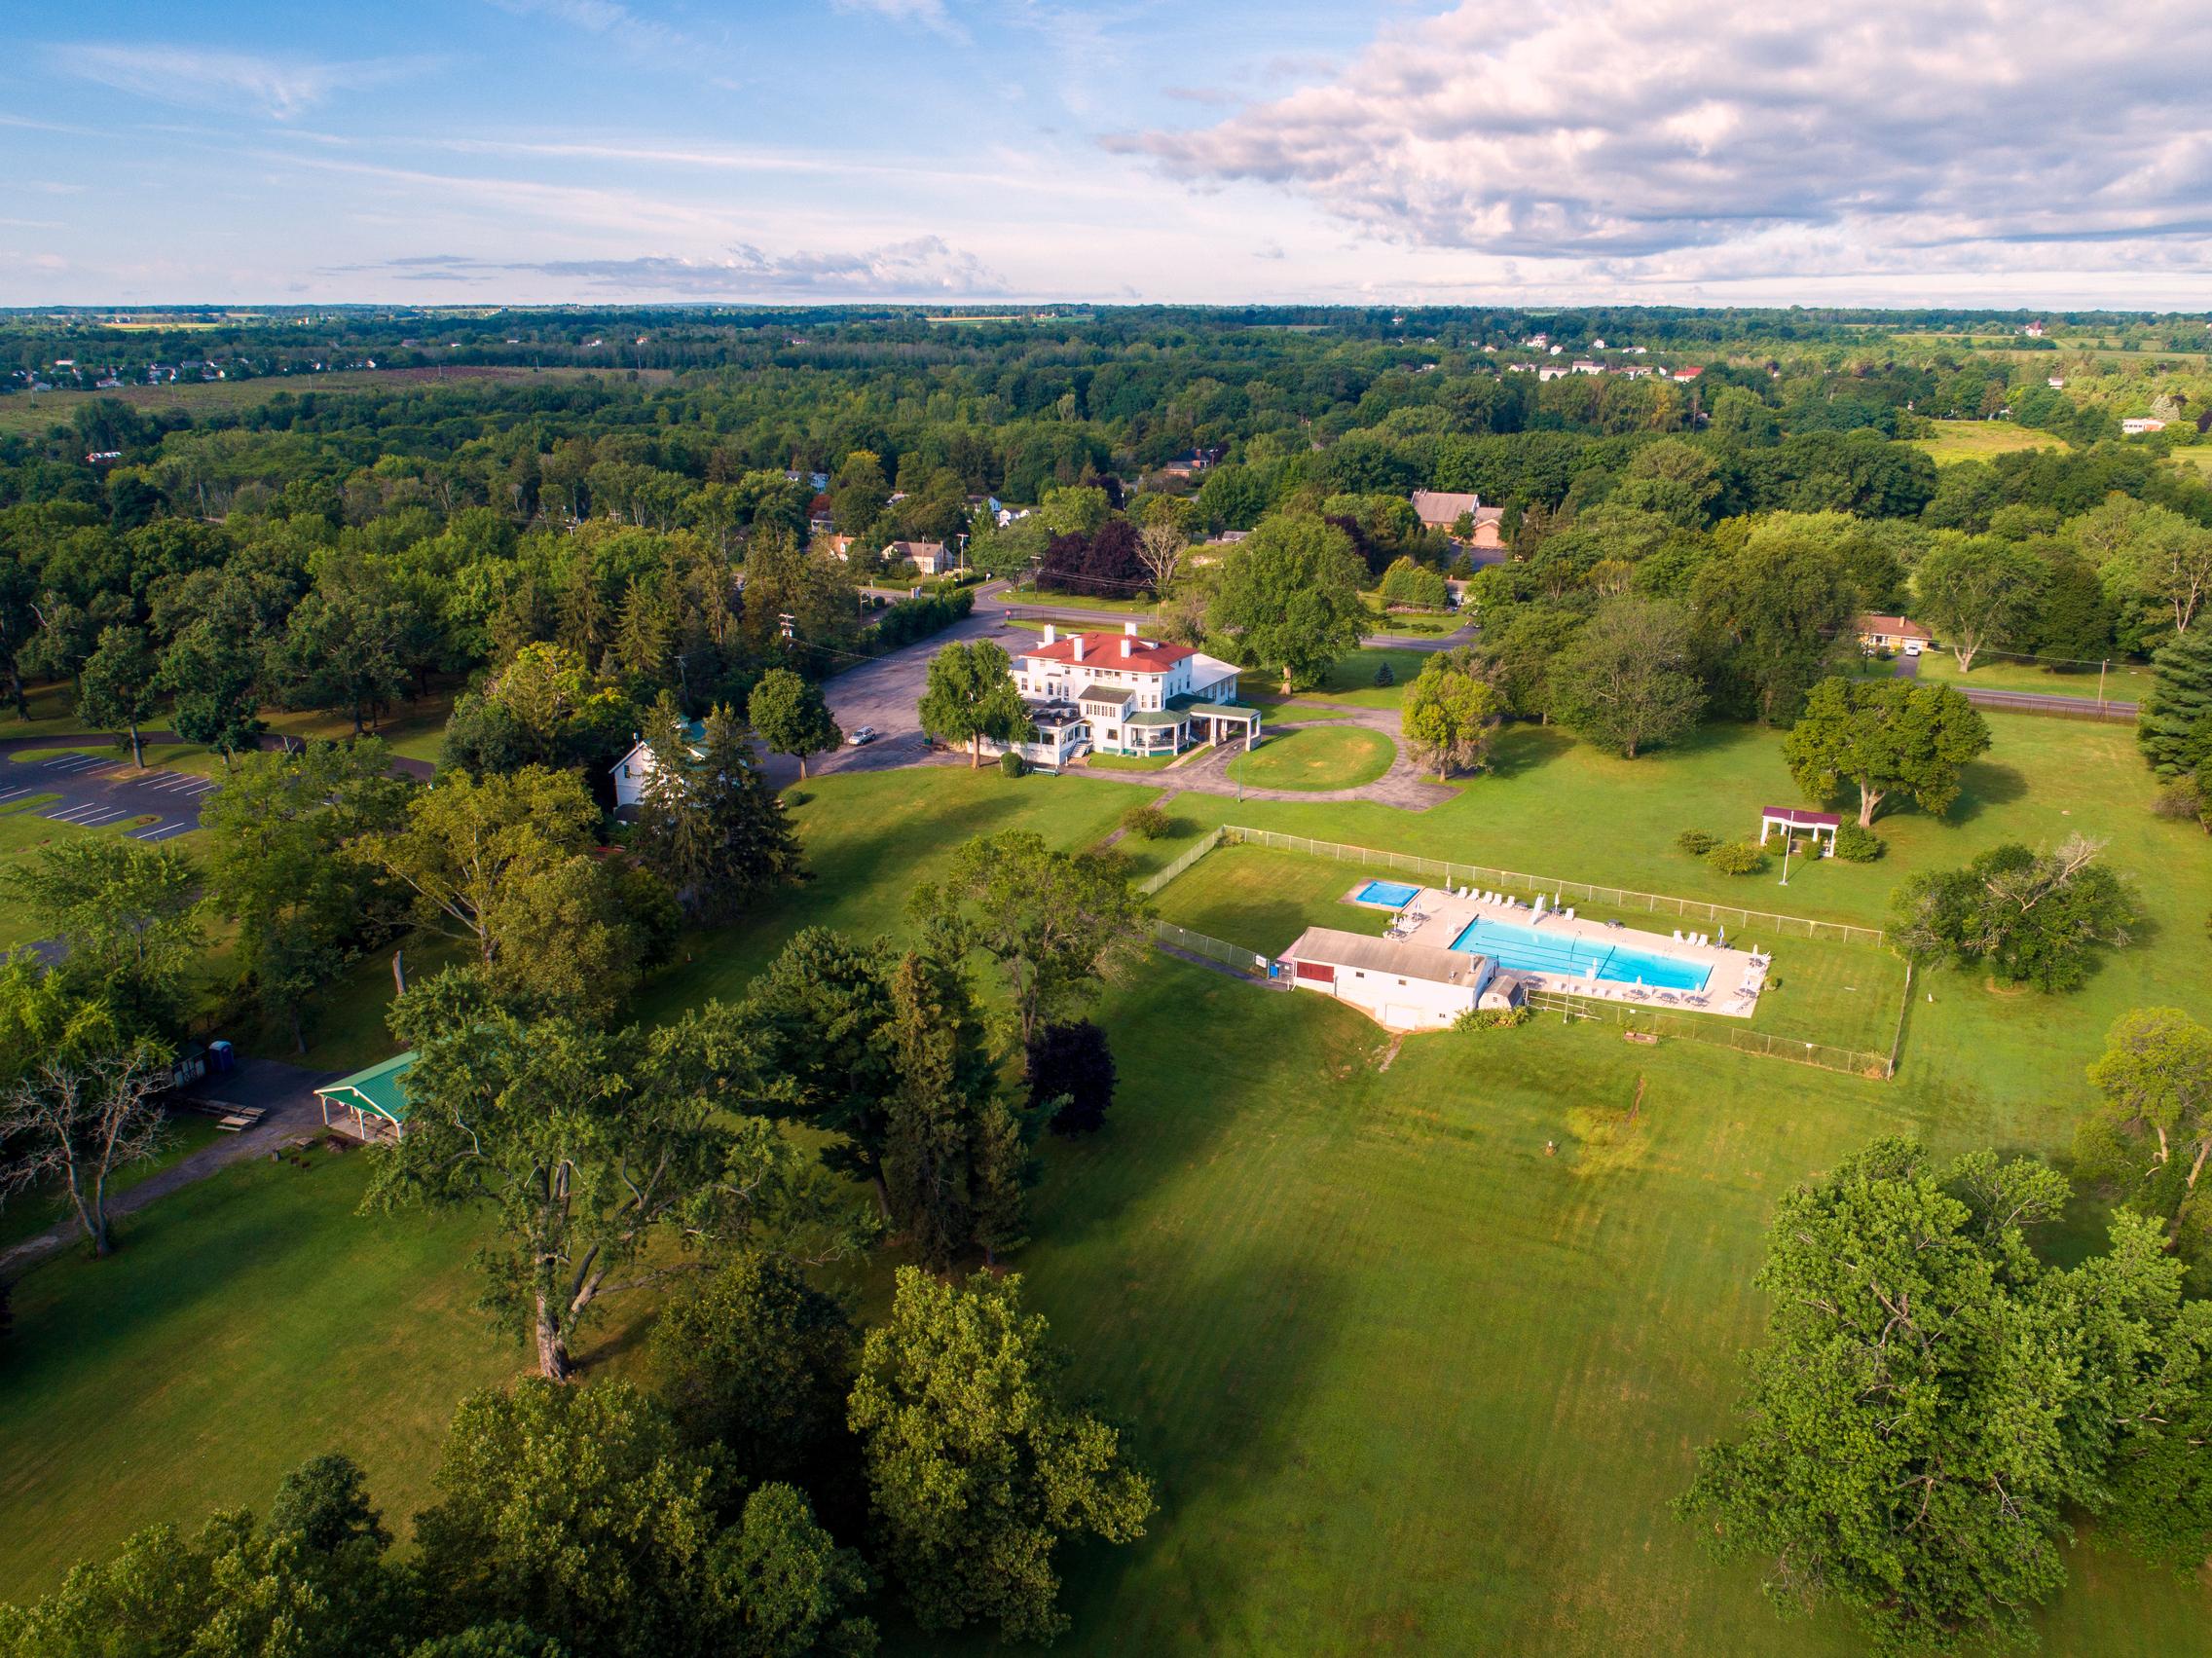 13 Seneca Lake Auction, American Legion, 1115 Lochland Rd, Geneva, NY 14456, Seneca Lake, Finger Lakes Property Listed For Sale by Michael DeRosa, Real Estate Broker, Michael DeRosa Exchange.JPG